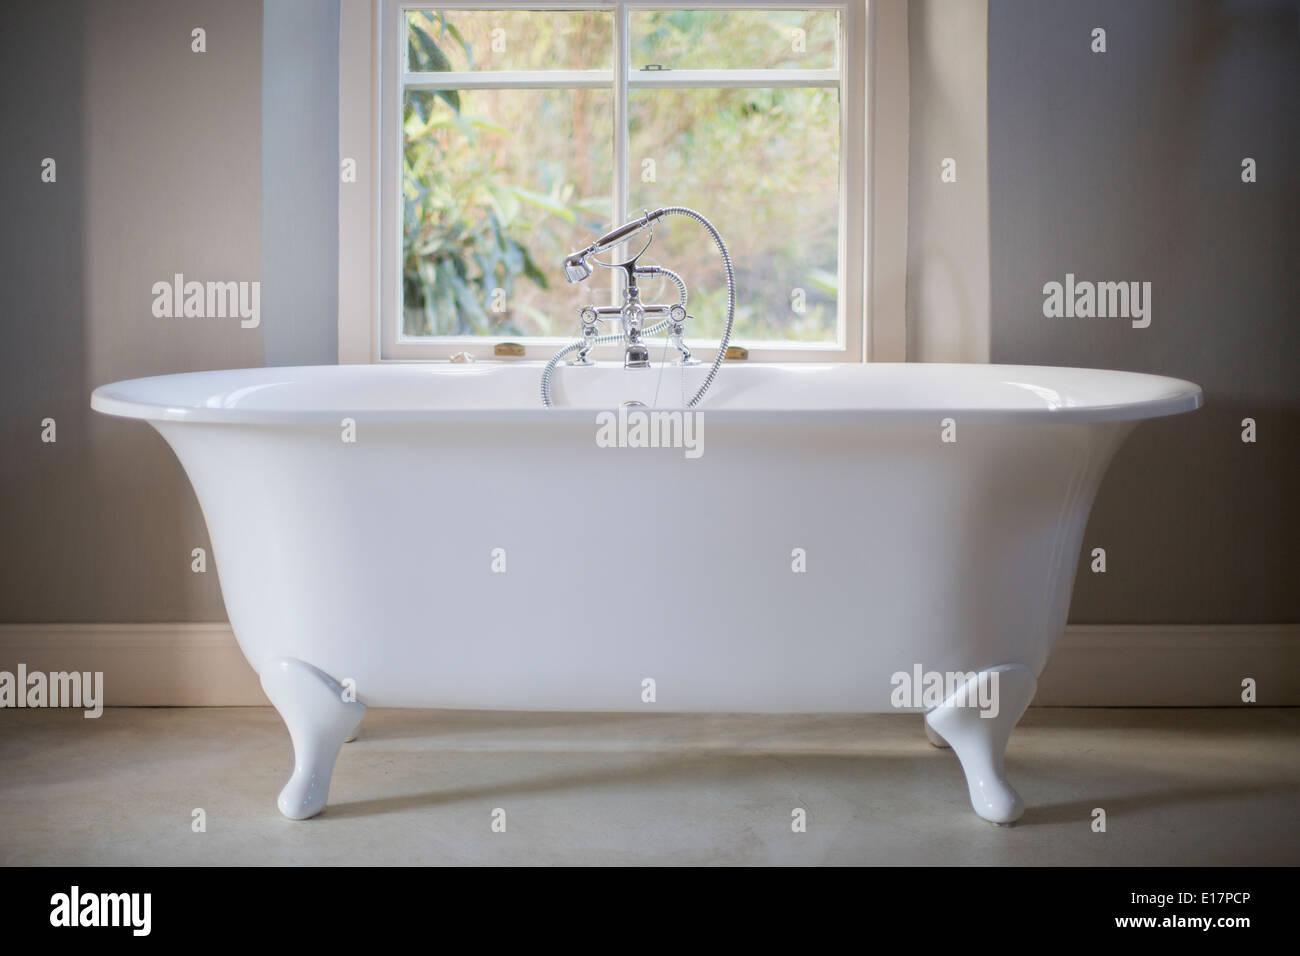 Claw foot tub in luxury bathroom Stock Photo: 69627398 - Alamy